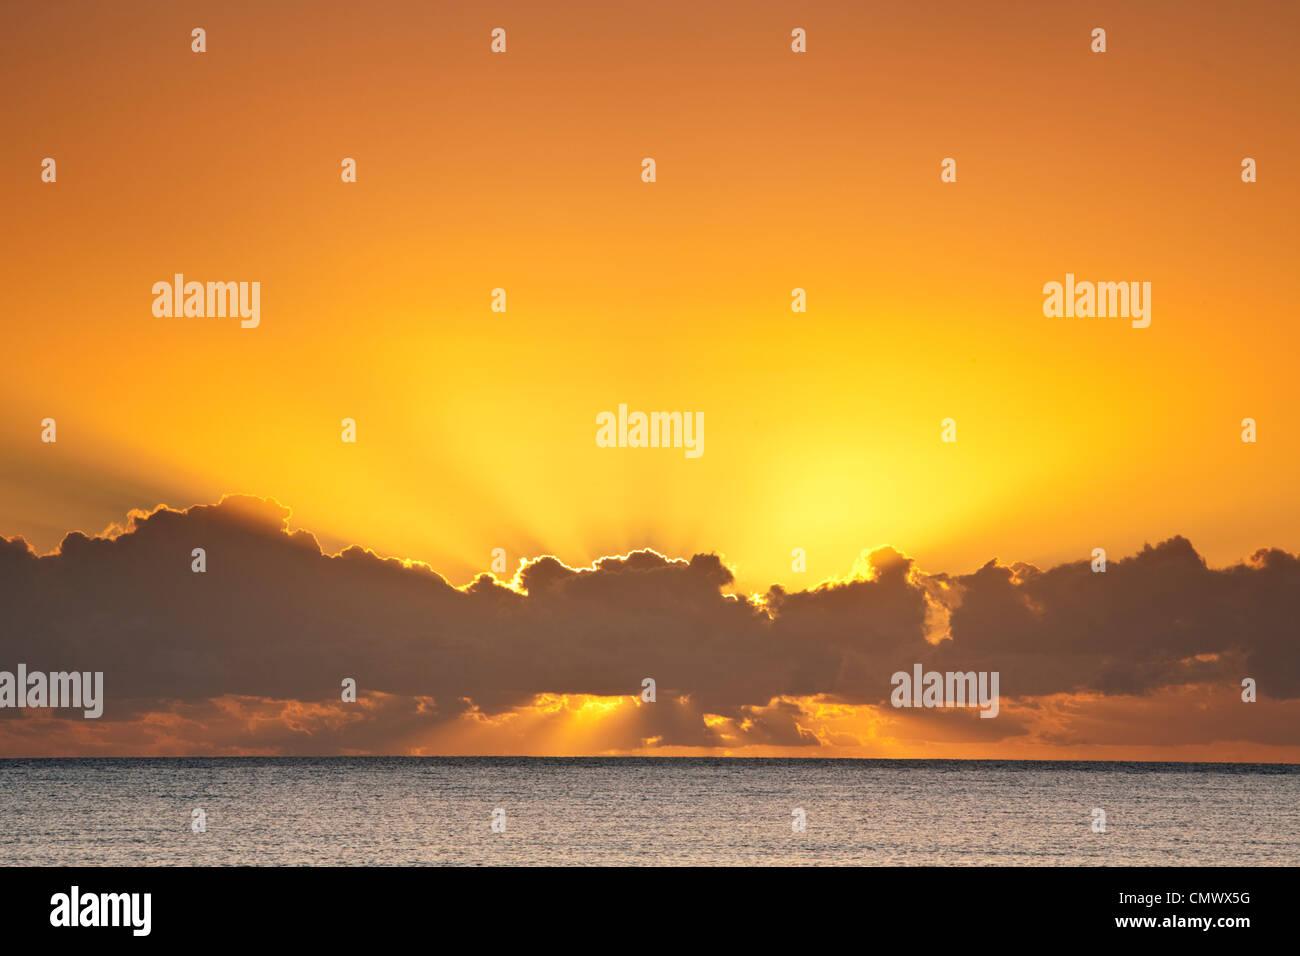 Sunrise over the Coral Sea. Kewarra Beach, Cairns, Queensland, Australia - Stock Image